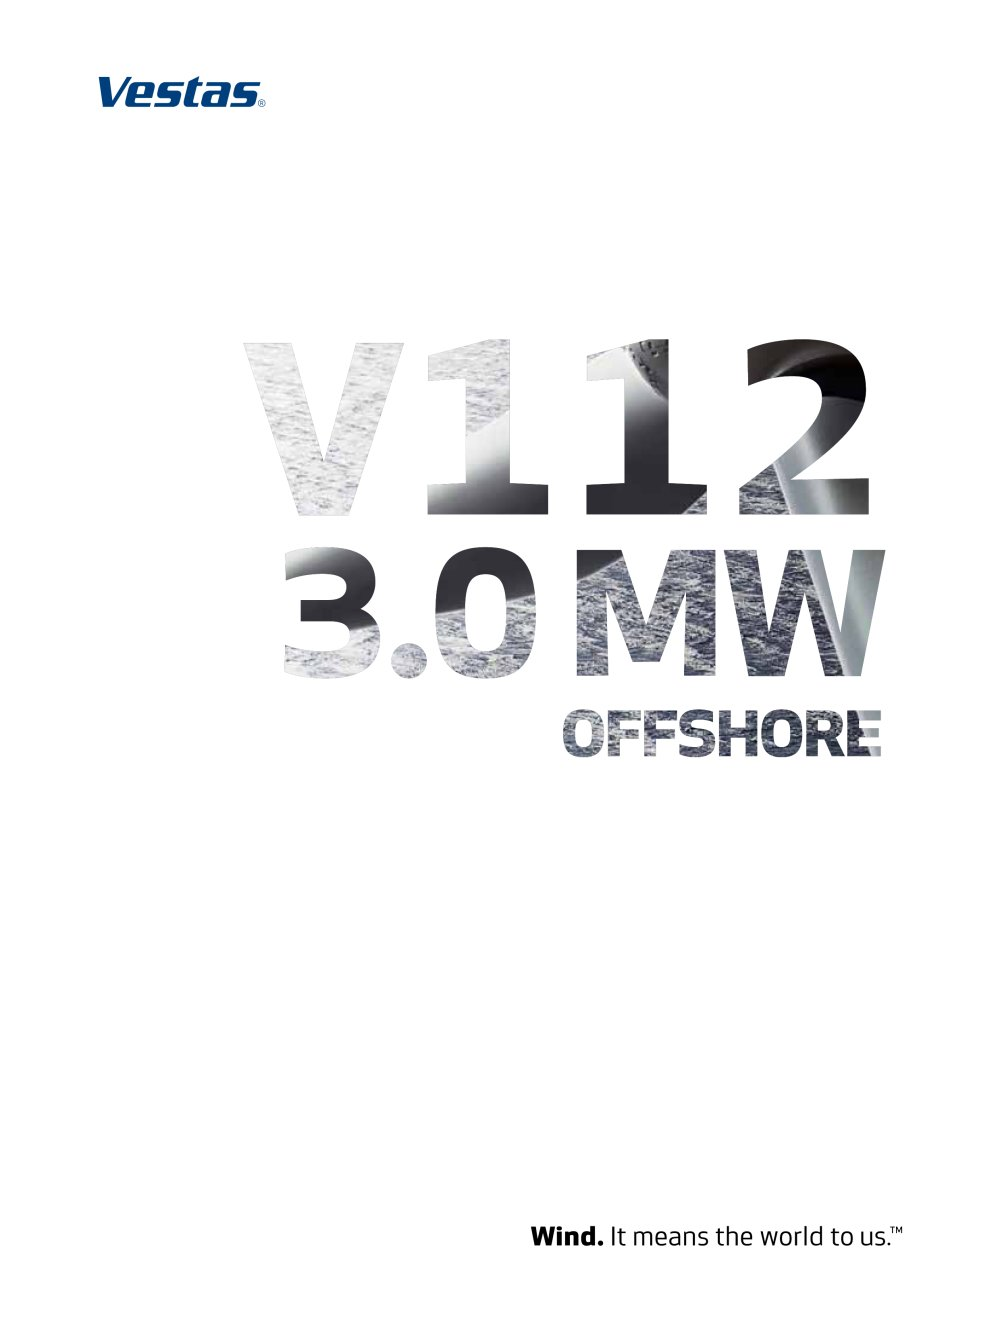 Vestas V112 30 Mw Offshore Vestas Pdf Catalogs Documentation